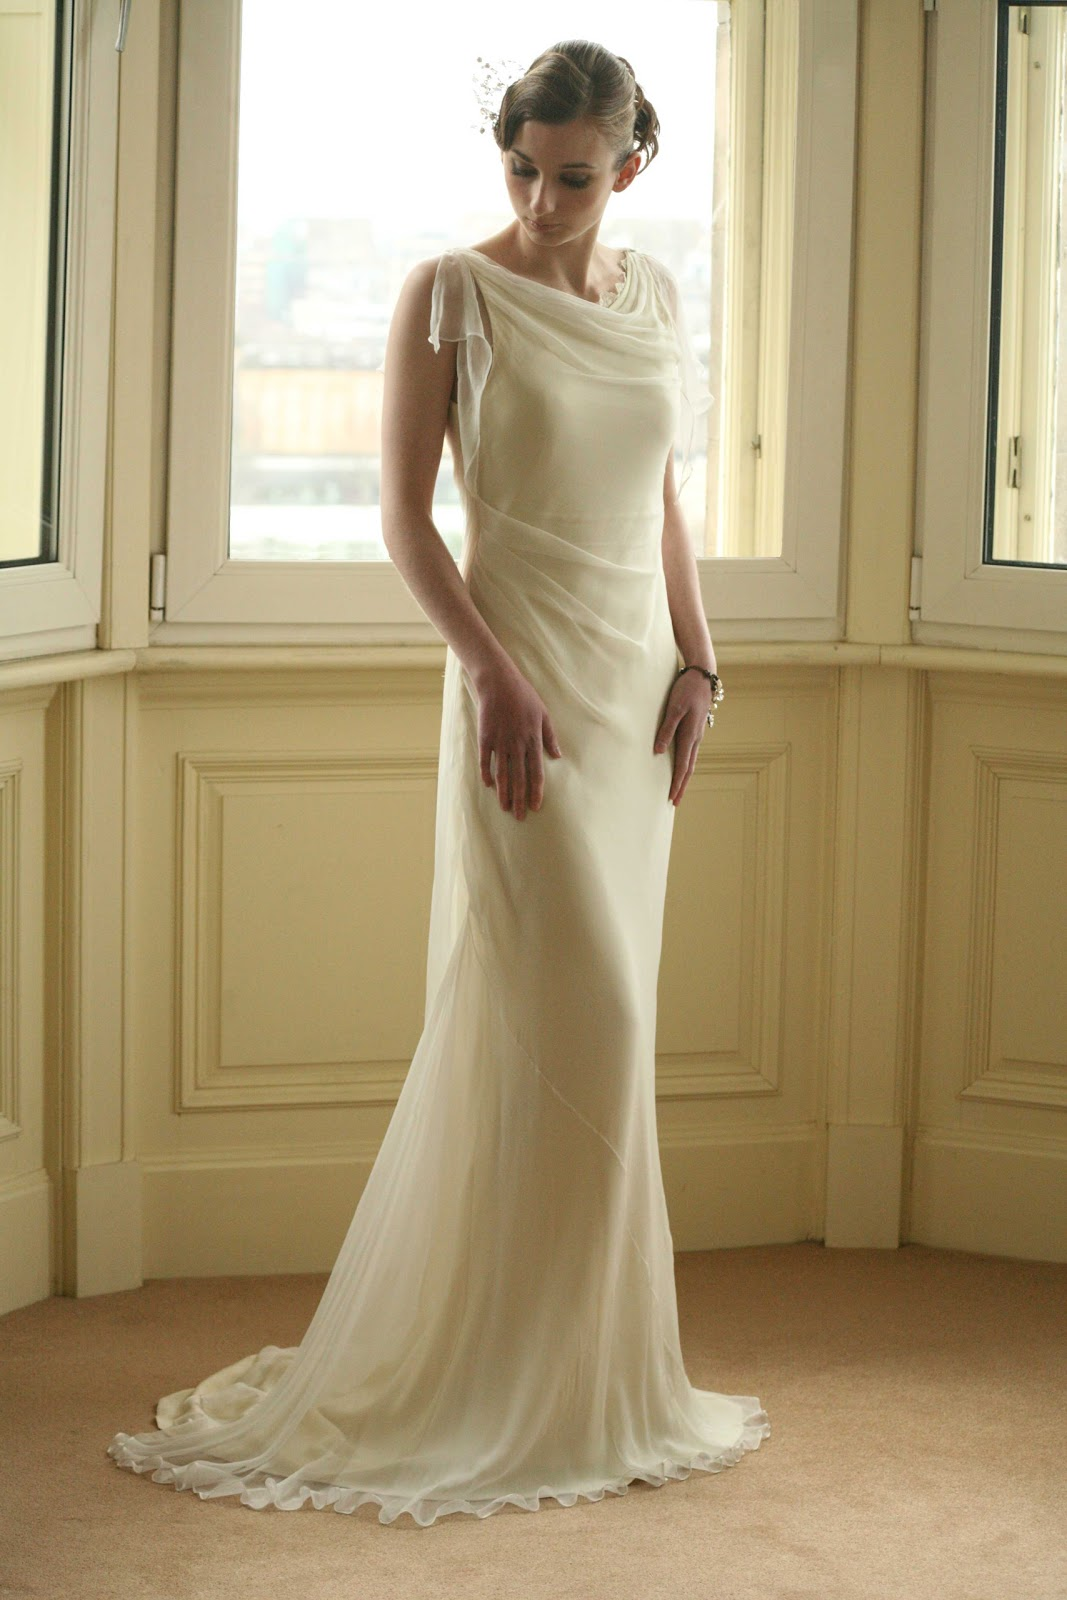 WhiteAzalea Simple Dresses Simple Chiffon Dresses Make a Cool Summer Wedding